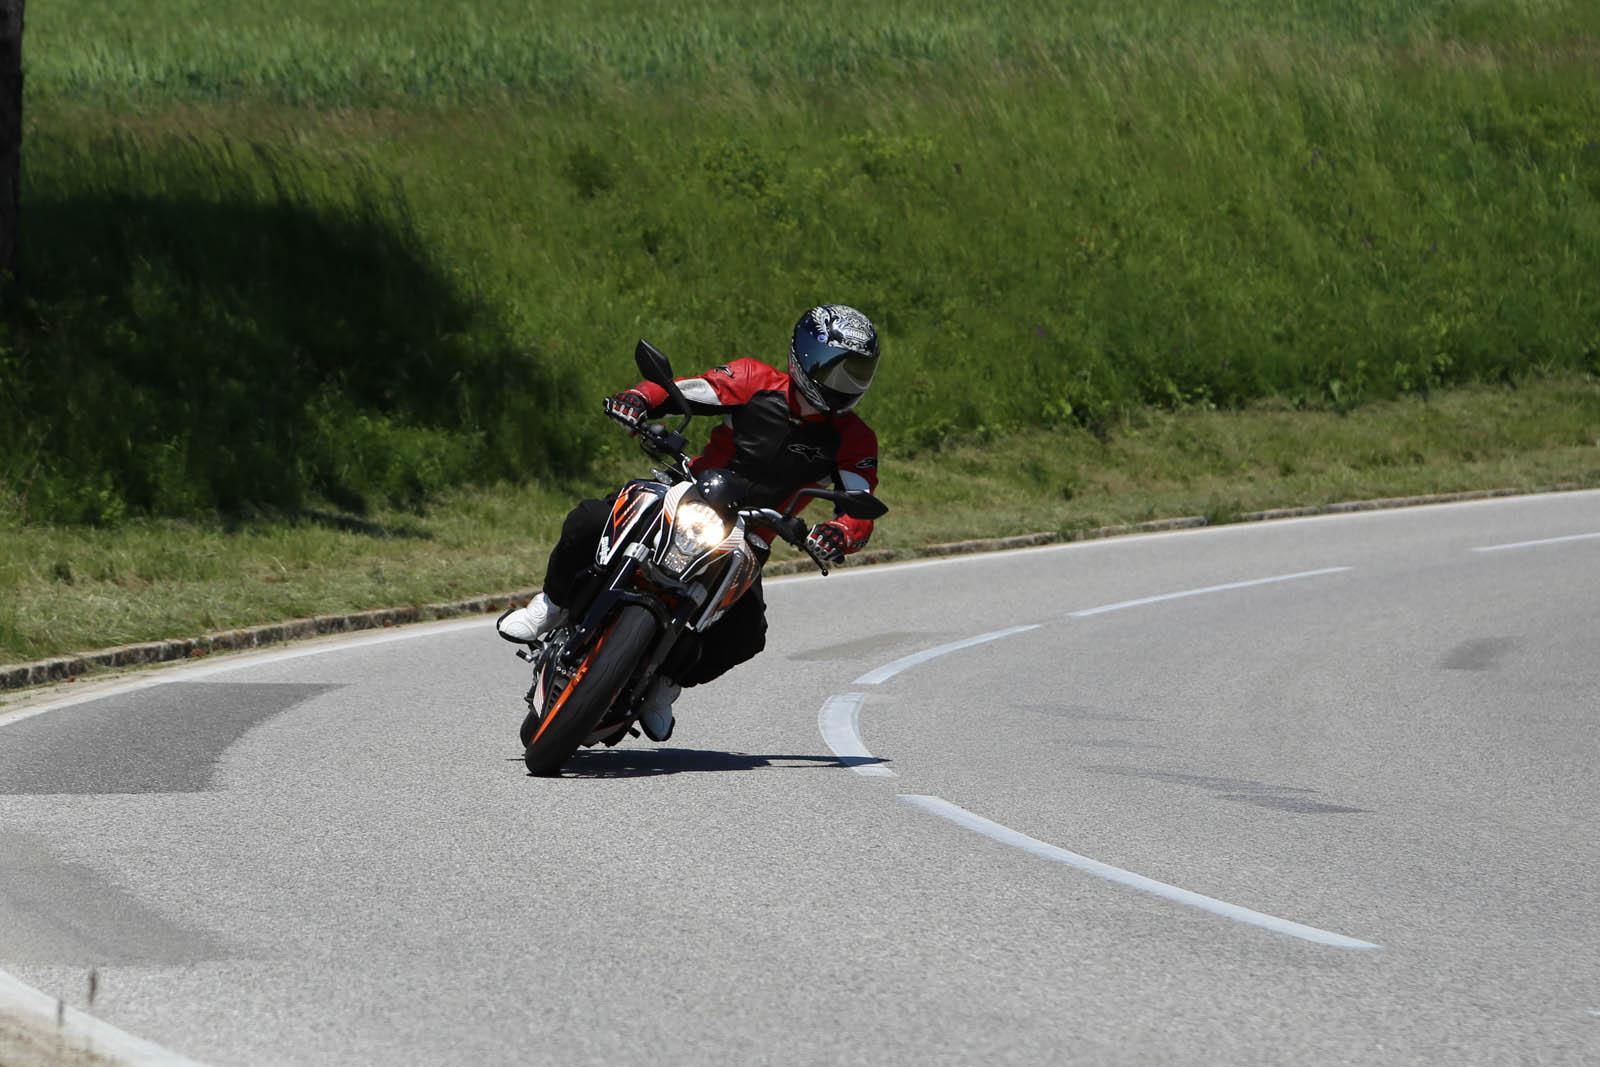 http://www.motorrad-bilder.at/slideshows/291/011178/NakedbikeTestAuswahl5.jpg